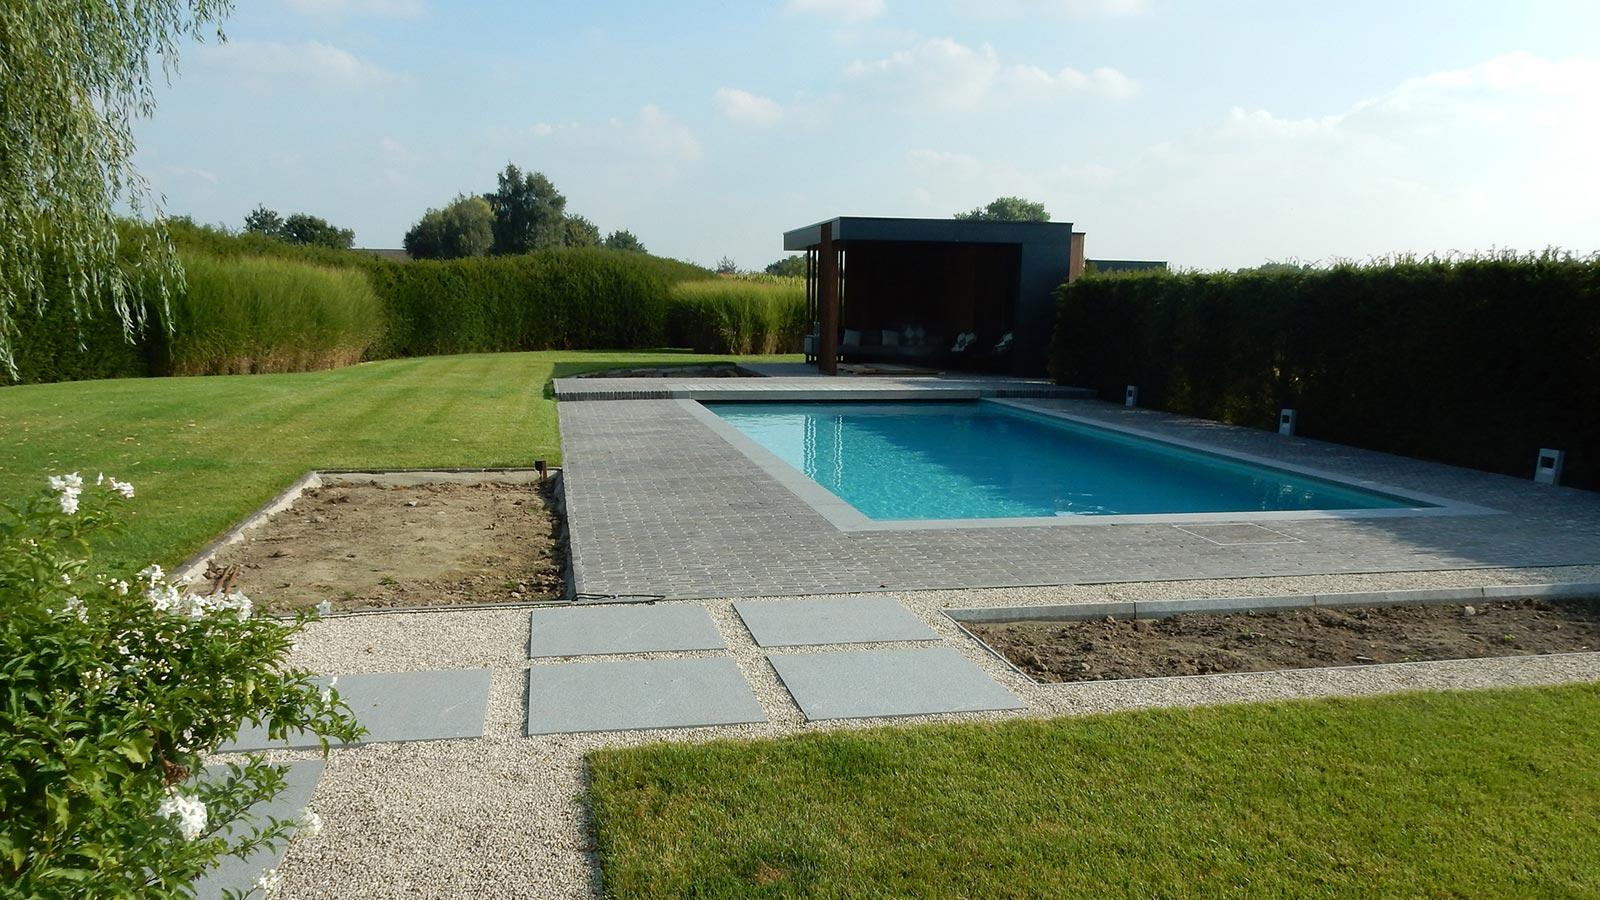 Strak poolhouse en tuinaanleg rond bestaand zwembad aaleg terras en paden in kleiklinkers - Zwembad terras hout photo ...